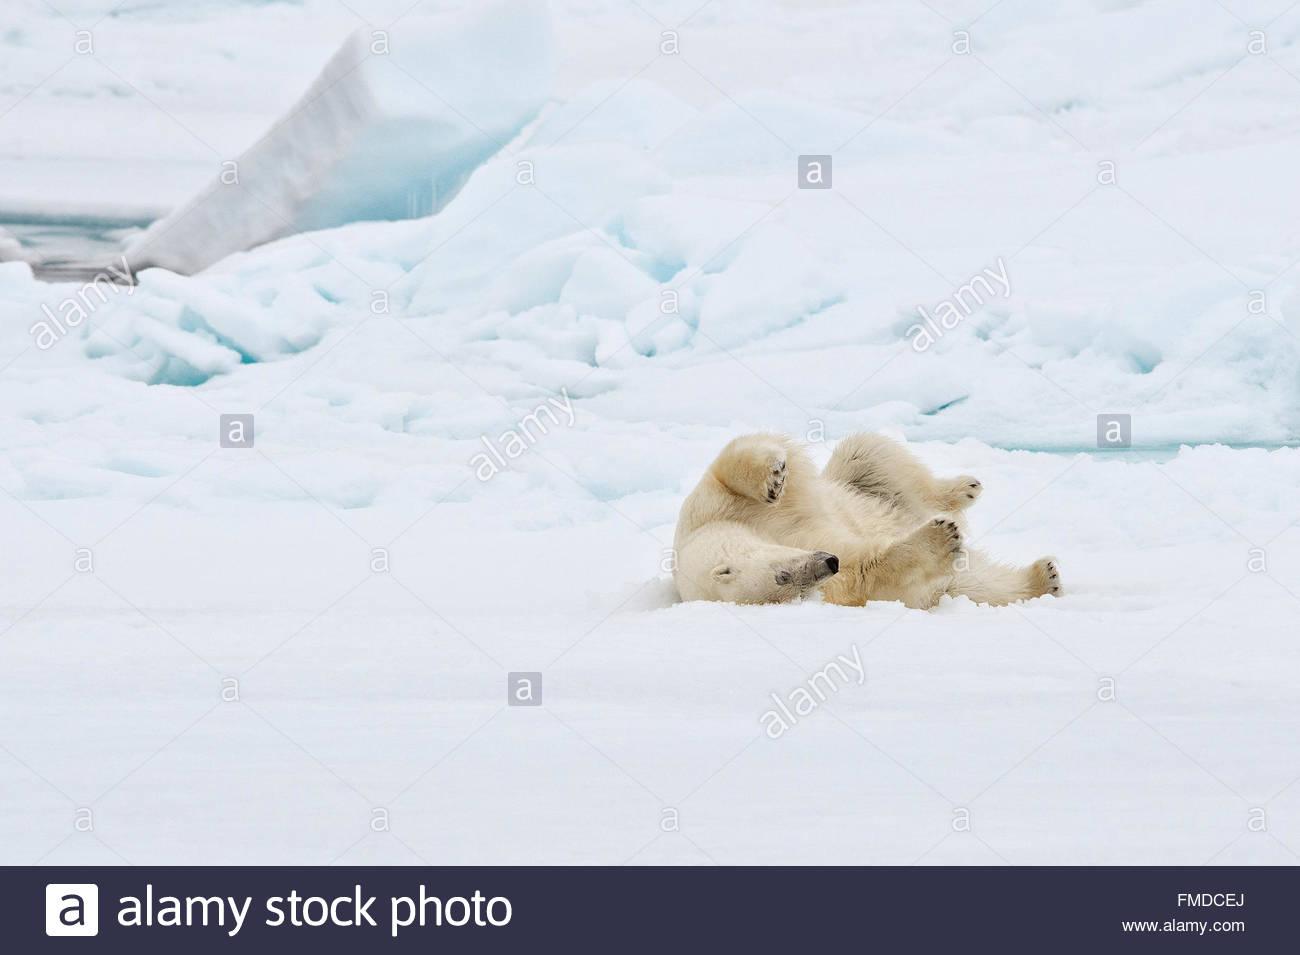 "Polar bear, Ursus Maritimus,""Thalarctos maritimus, family Ursidae"" rolling on pack ice. Stock Photo"